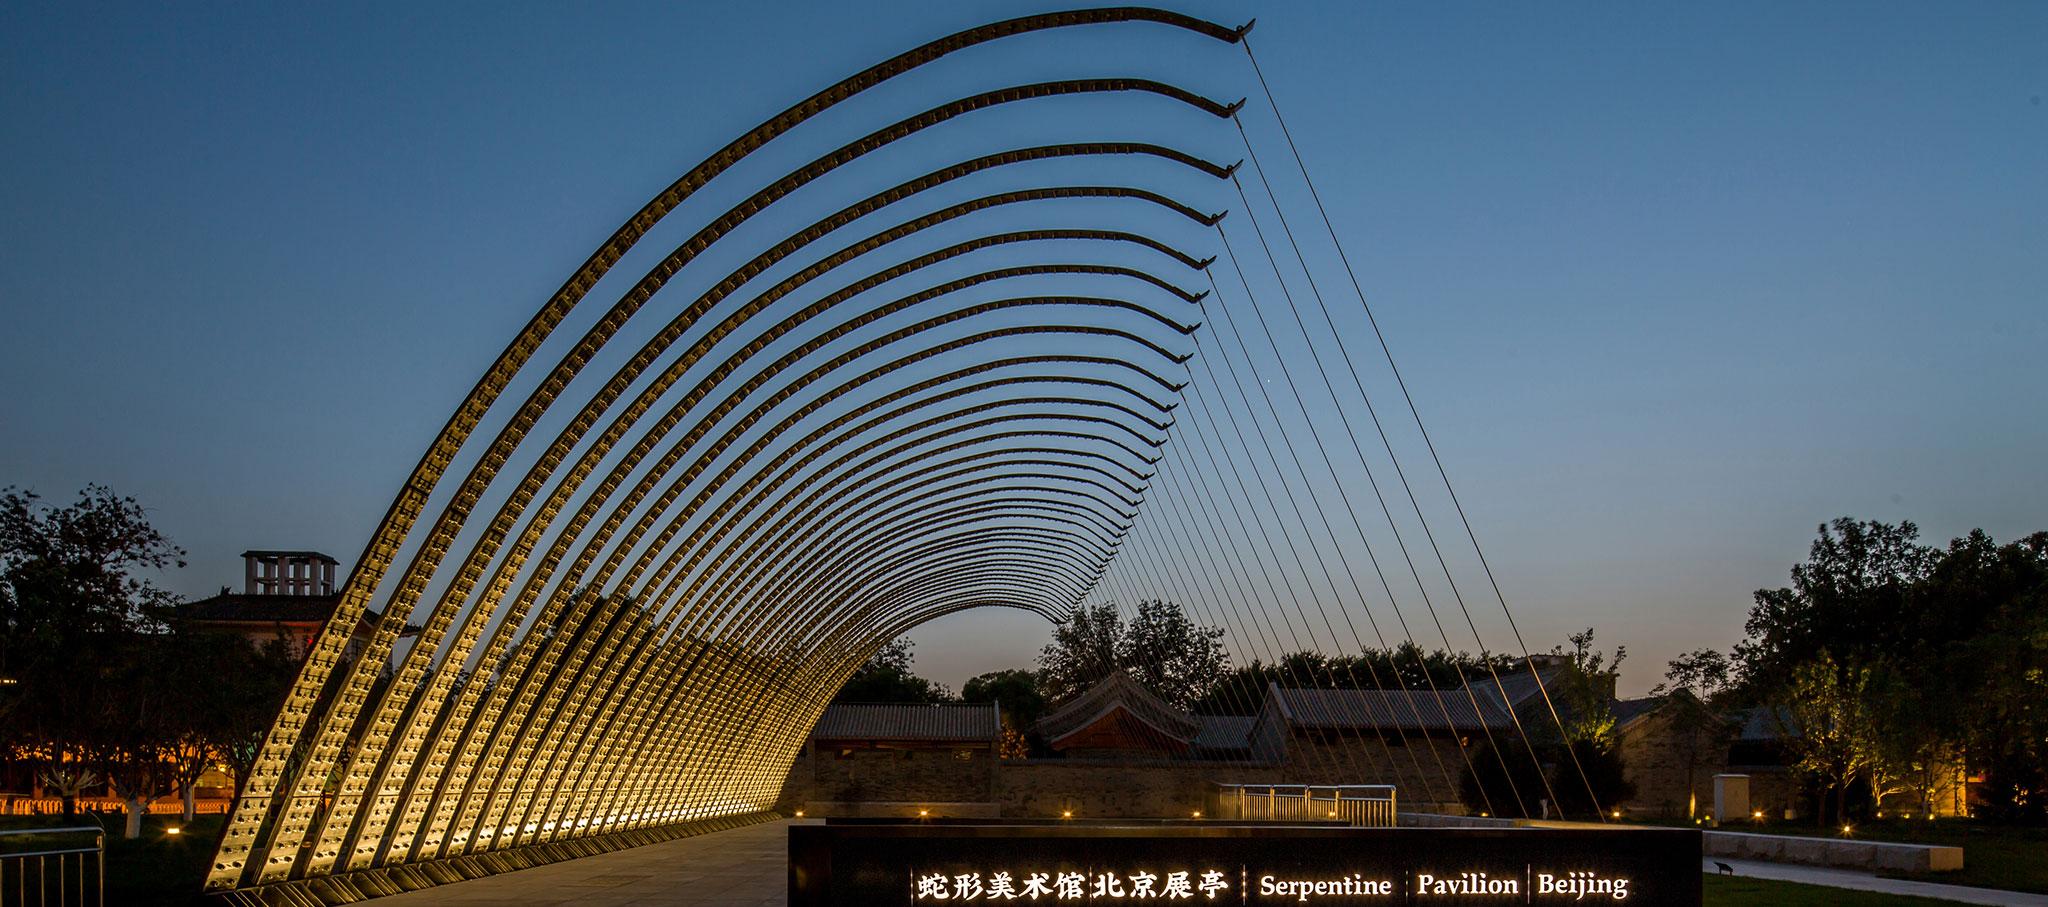 Pabellón de la Serpentine 2018, en Pekín, diseñado por JIAKUN Architects, WF Central, Pekín (30 de mayo - 31 de octubre de 2018). WF CENTRAL © 2018